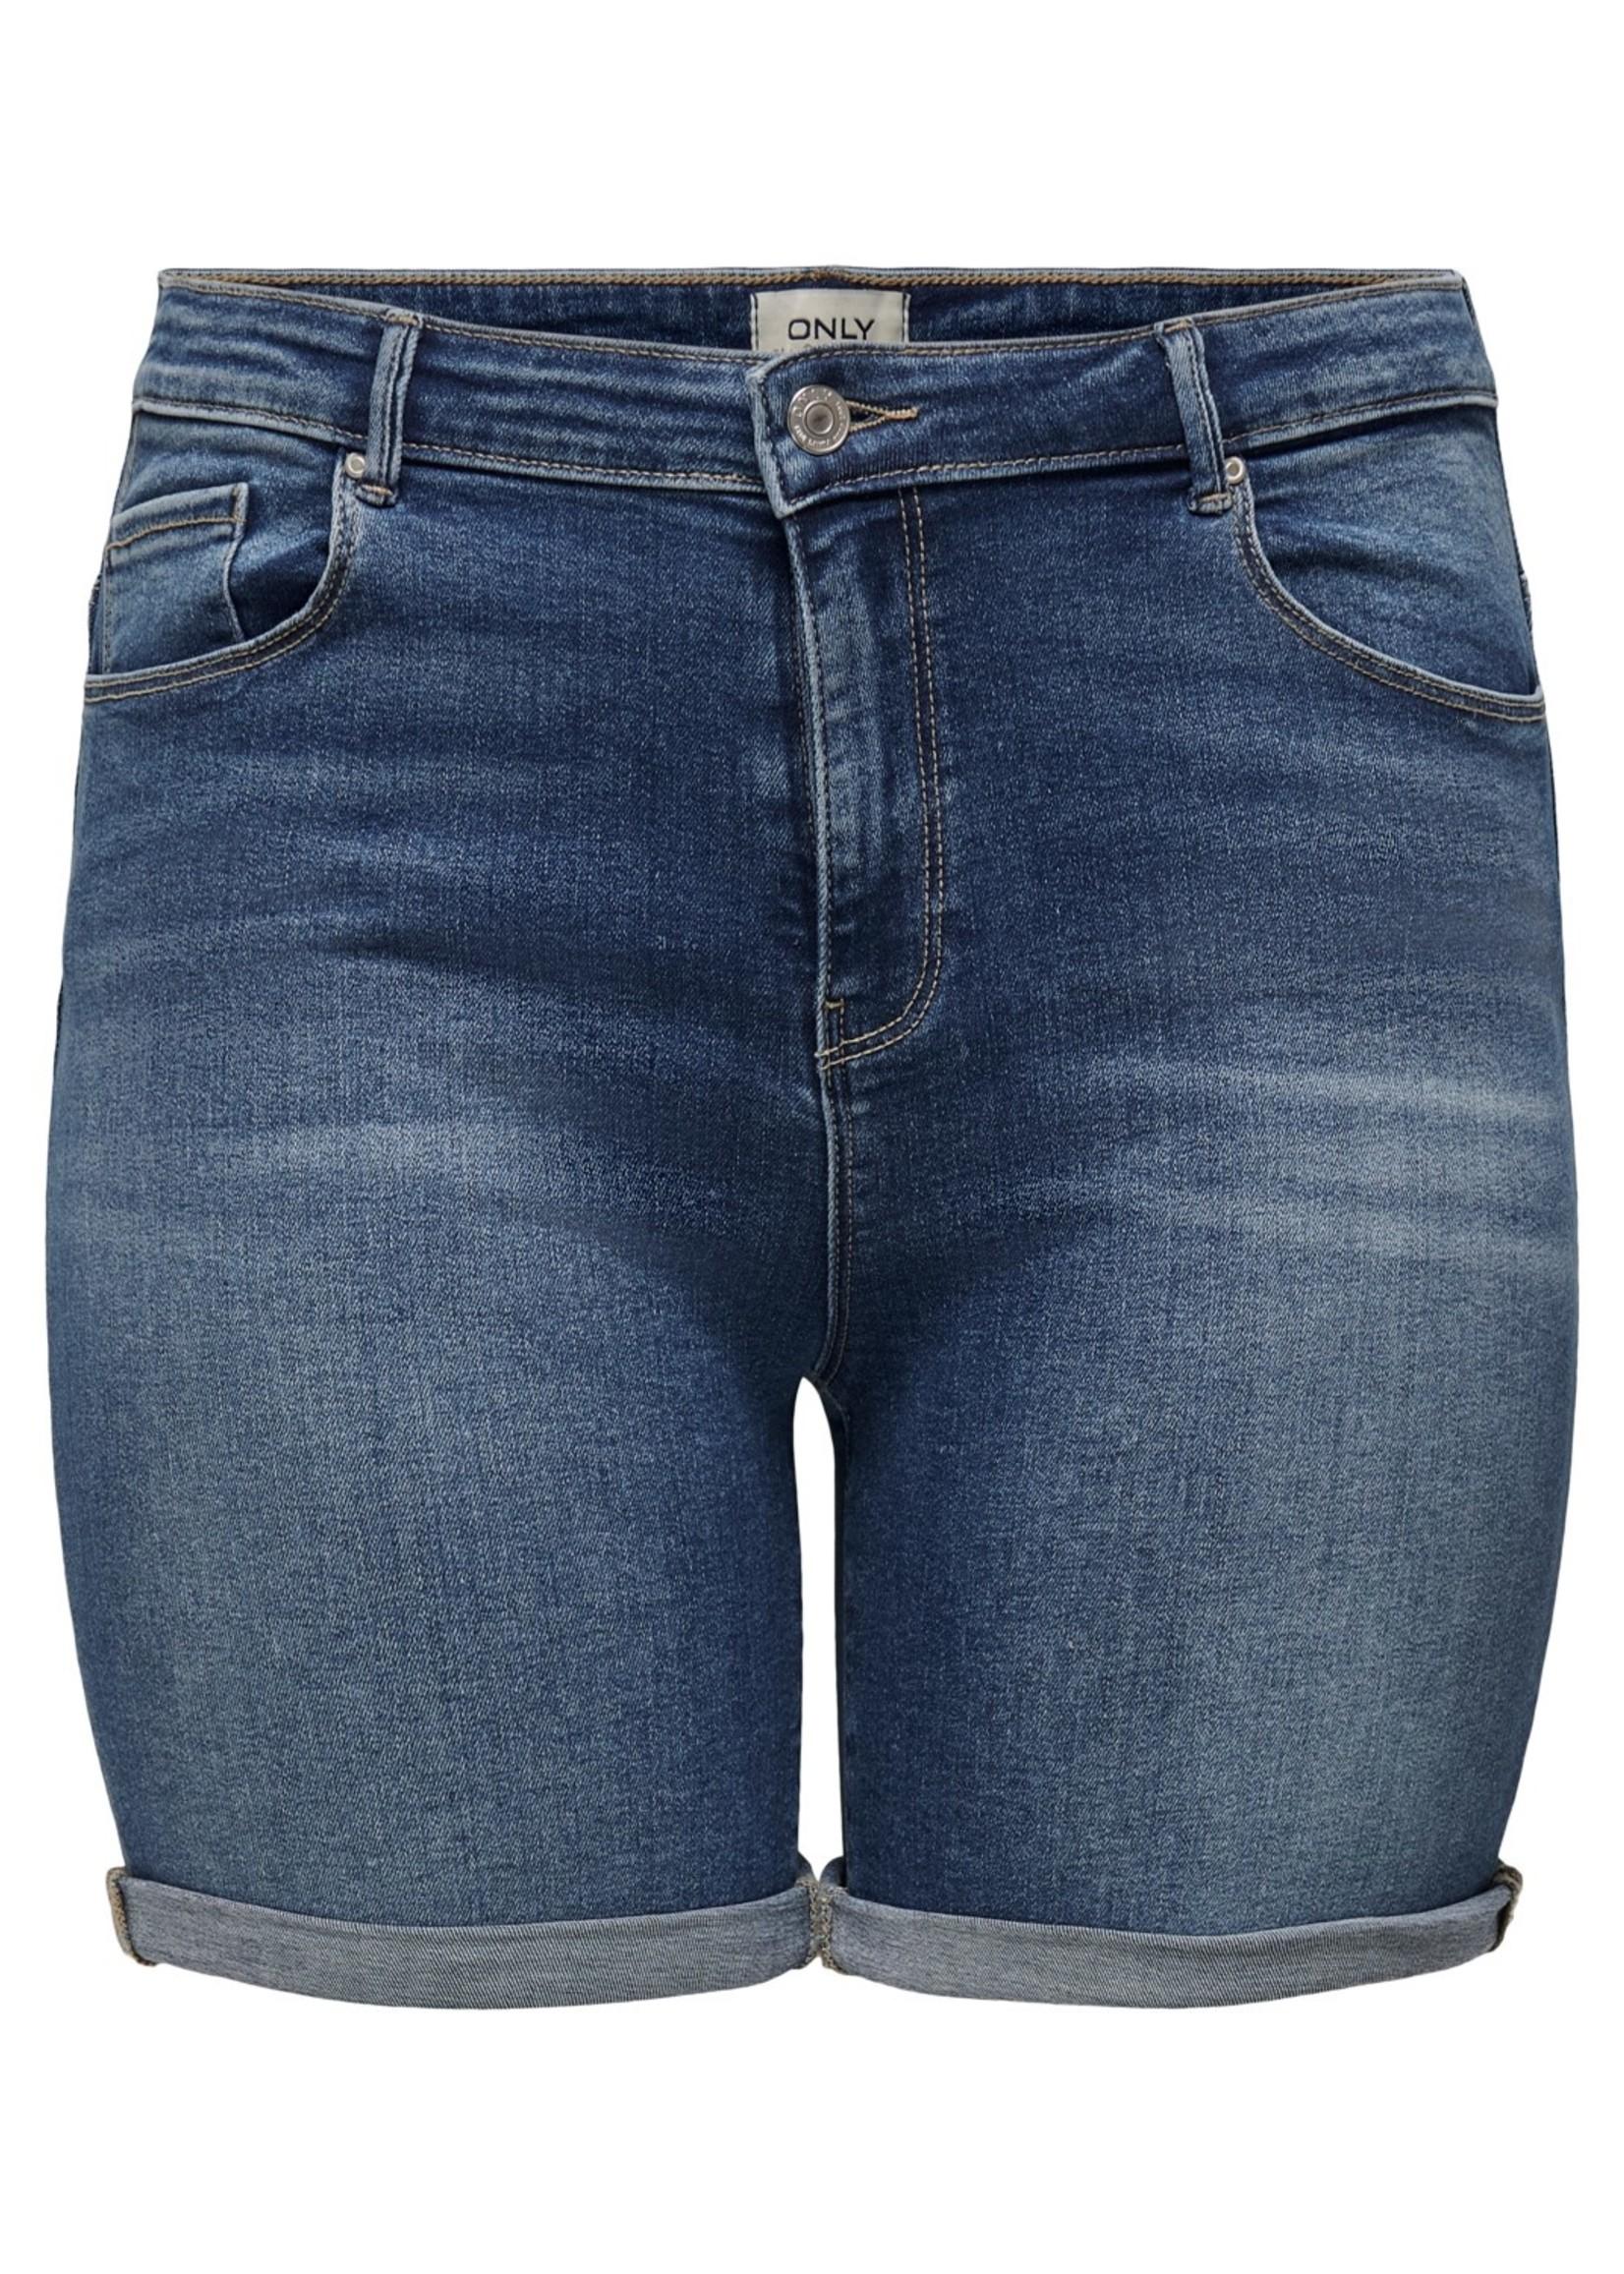 Only Carmakoma Only Carmakoma Laola Shorts